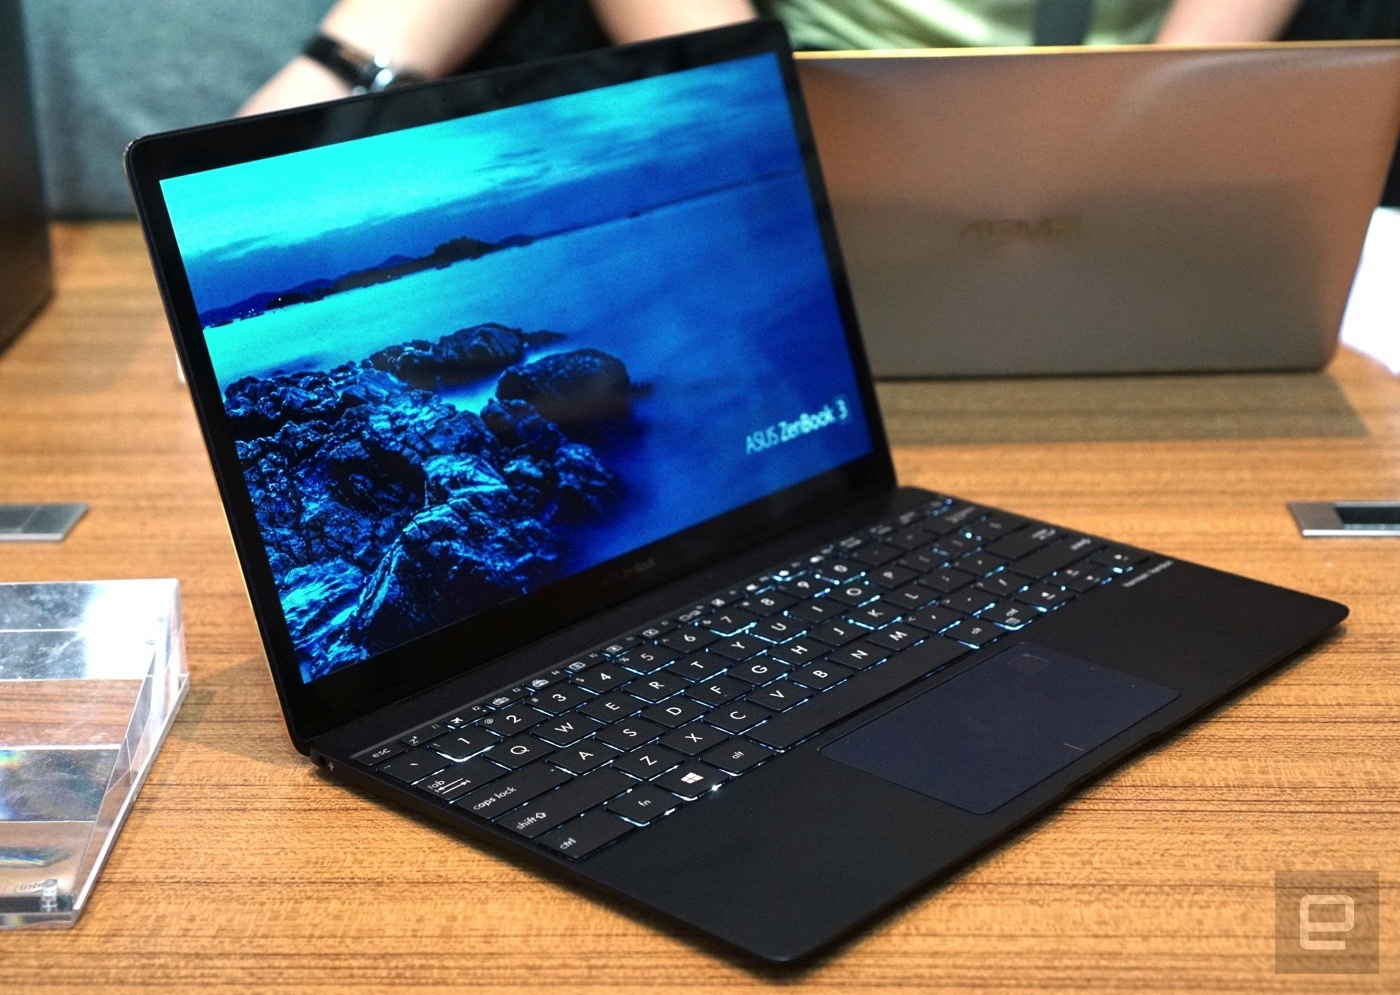 Asus ZenBook 3 tromfol MacBook! Čím prekvapil?